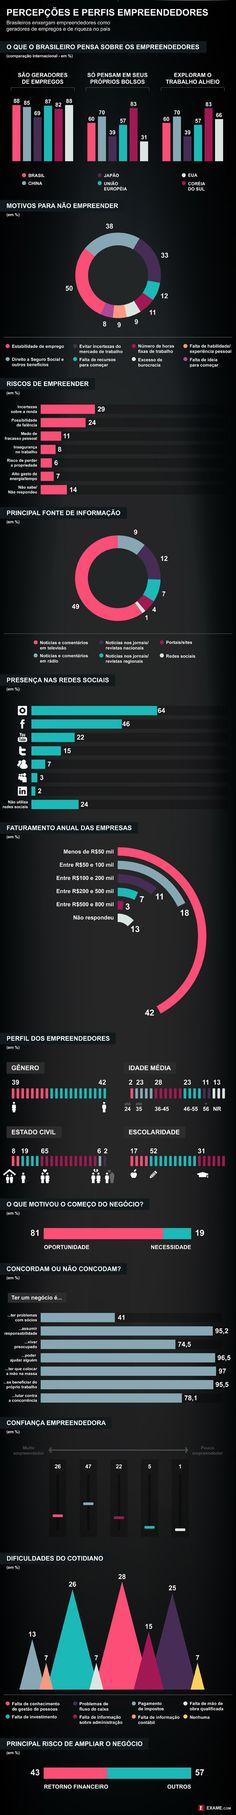 As visões e os perfis dos empreendedores brasileiros